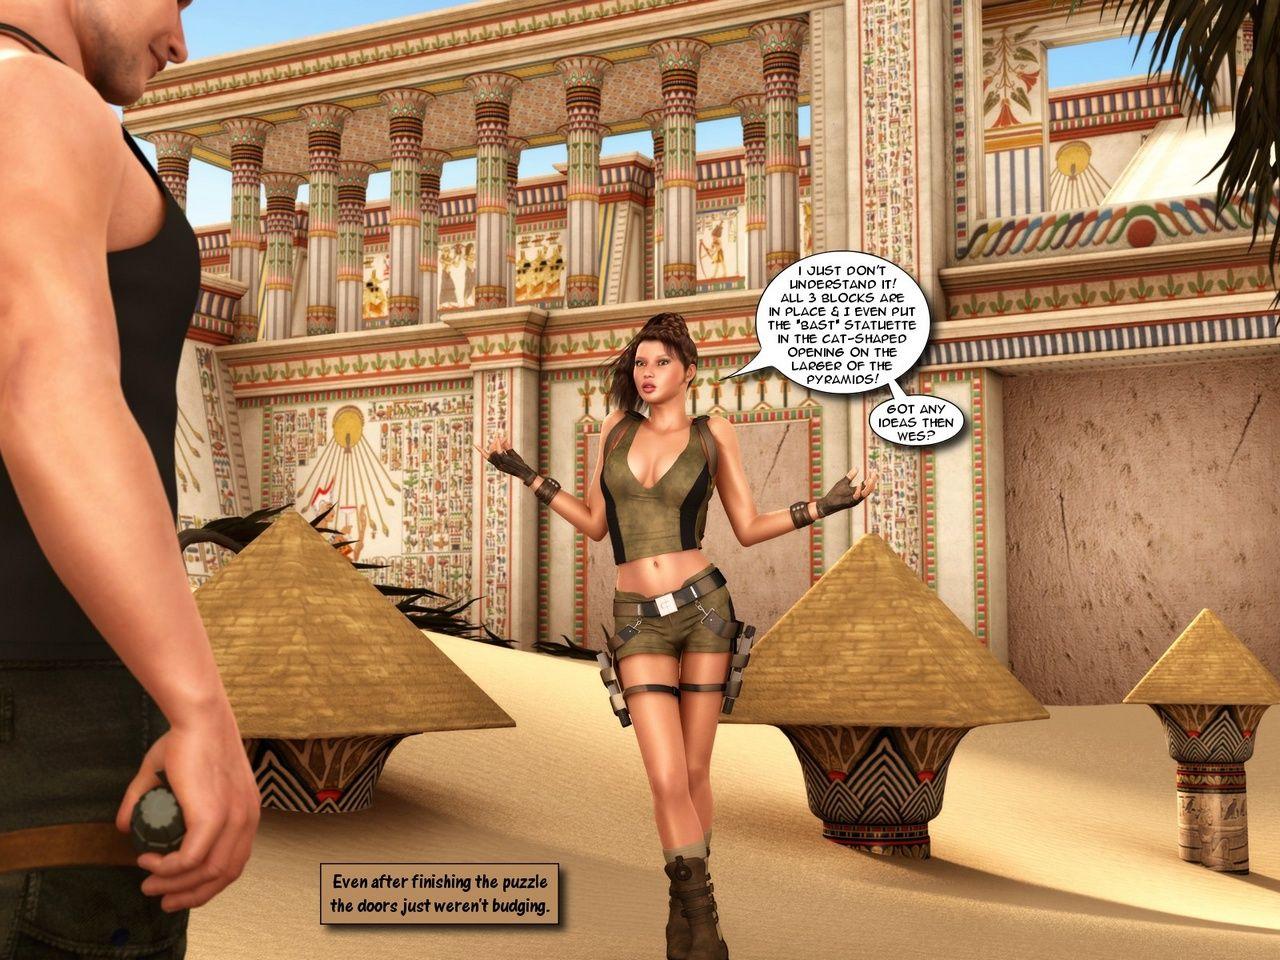 Catacomb Raider - Sands Be incumbent on Seniority - loyalty 4